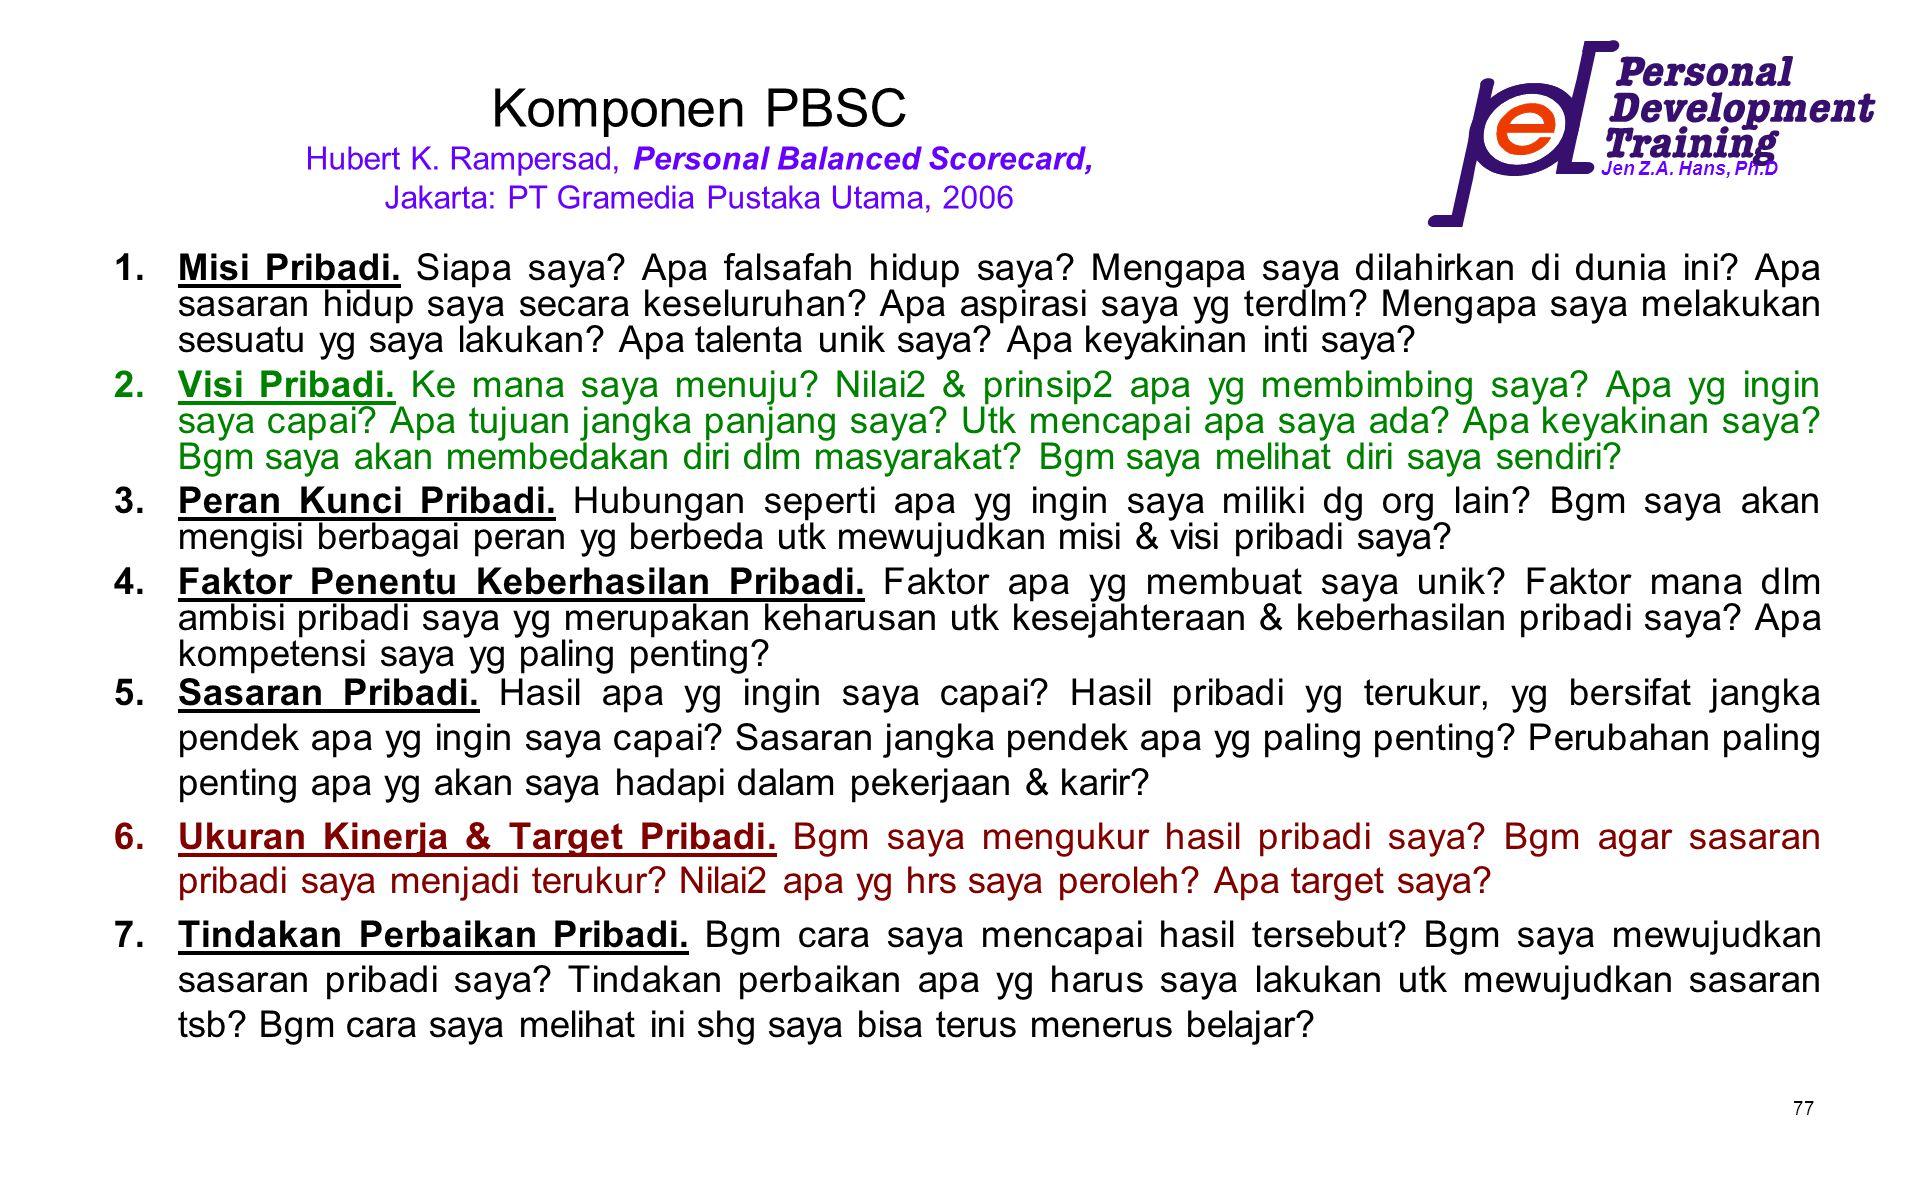 Komponen PBSC Hubert K. Rampersad, Personal Balanced Scorecard, Jakarta: PT Gramedia Pustaka Utama, 2006